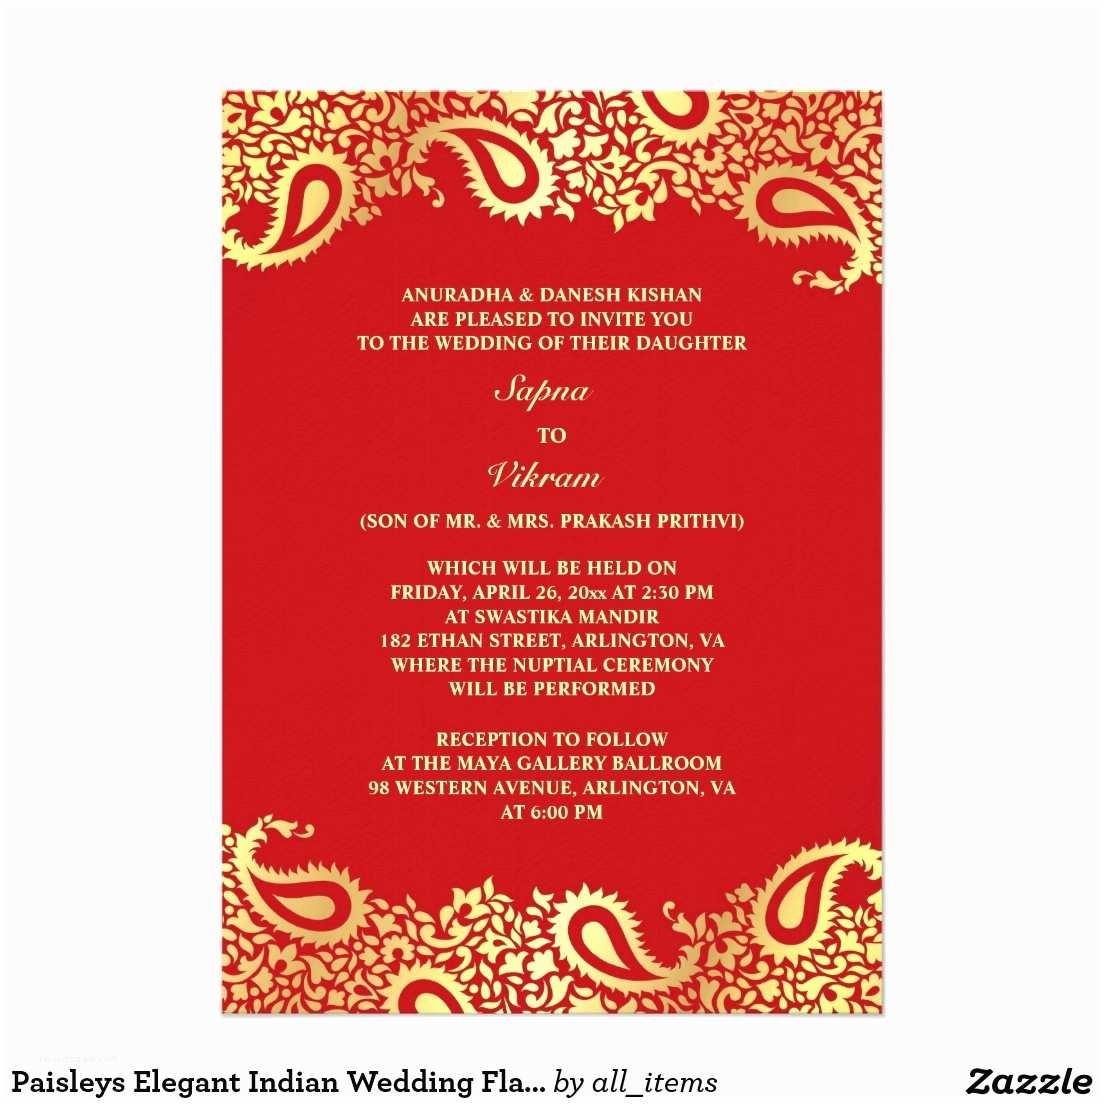 Wedding Invitation Styles Create Indian Wedding Invitations Designs Ideas